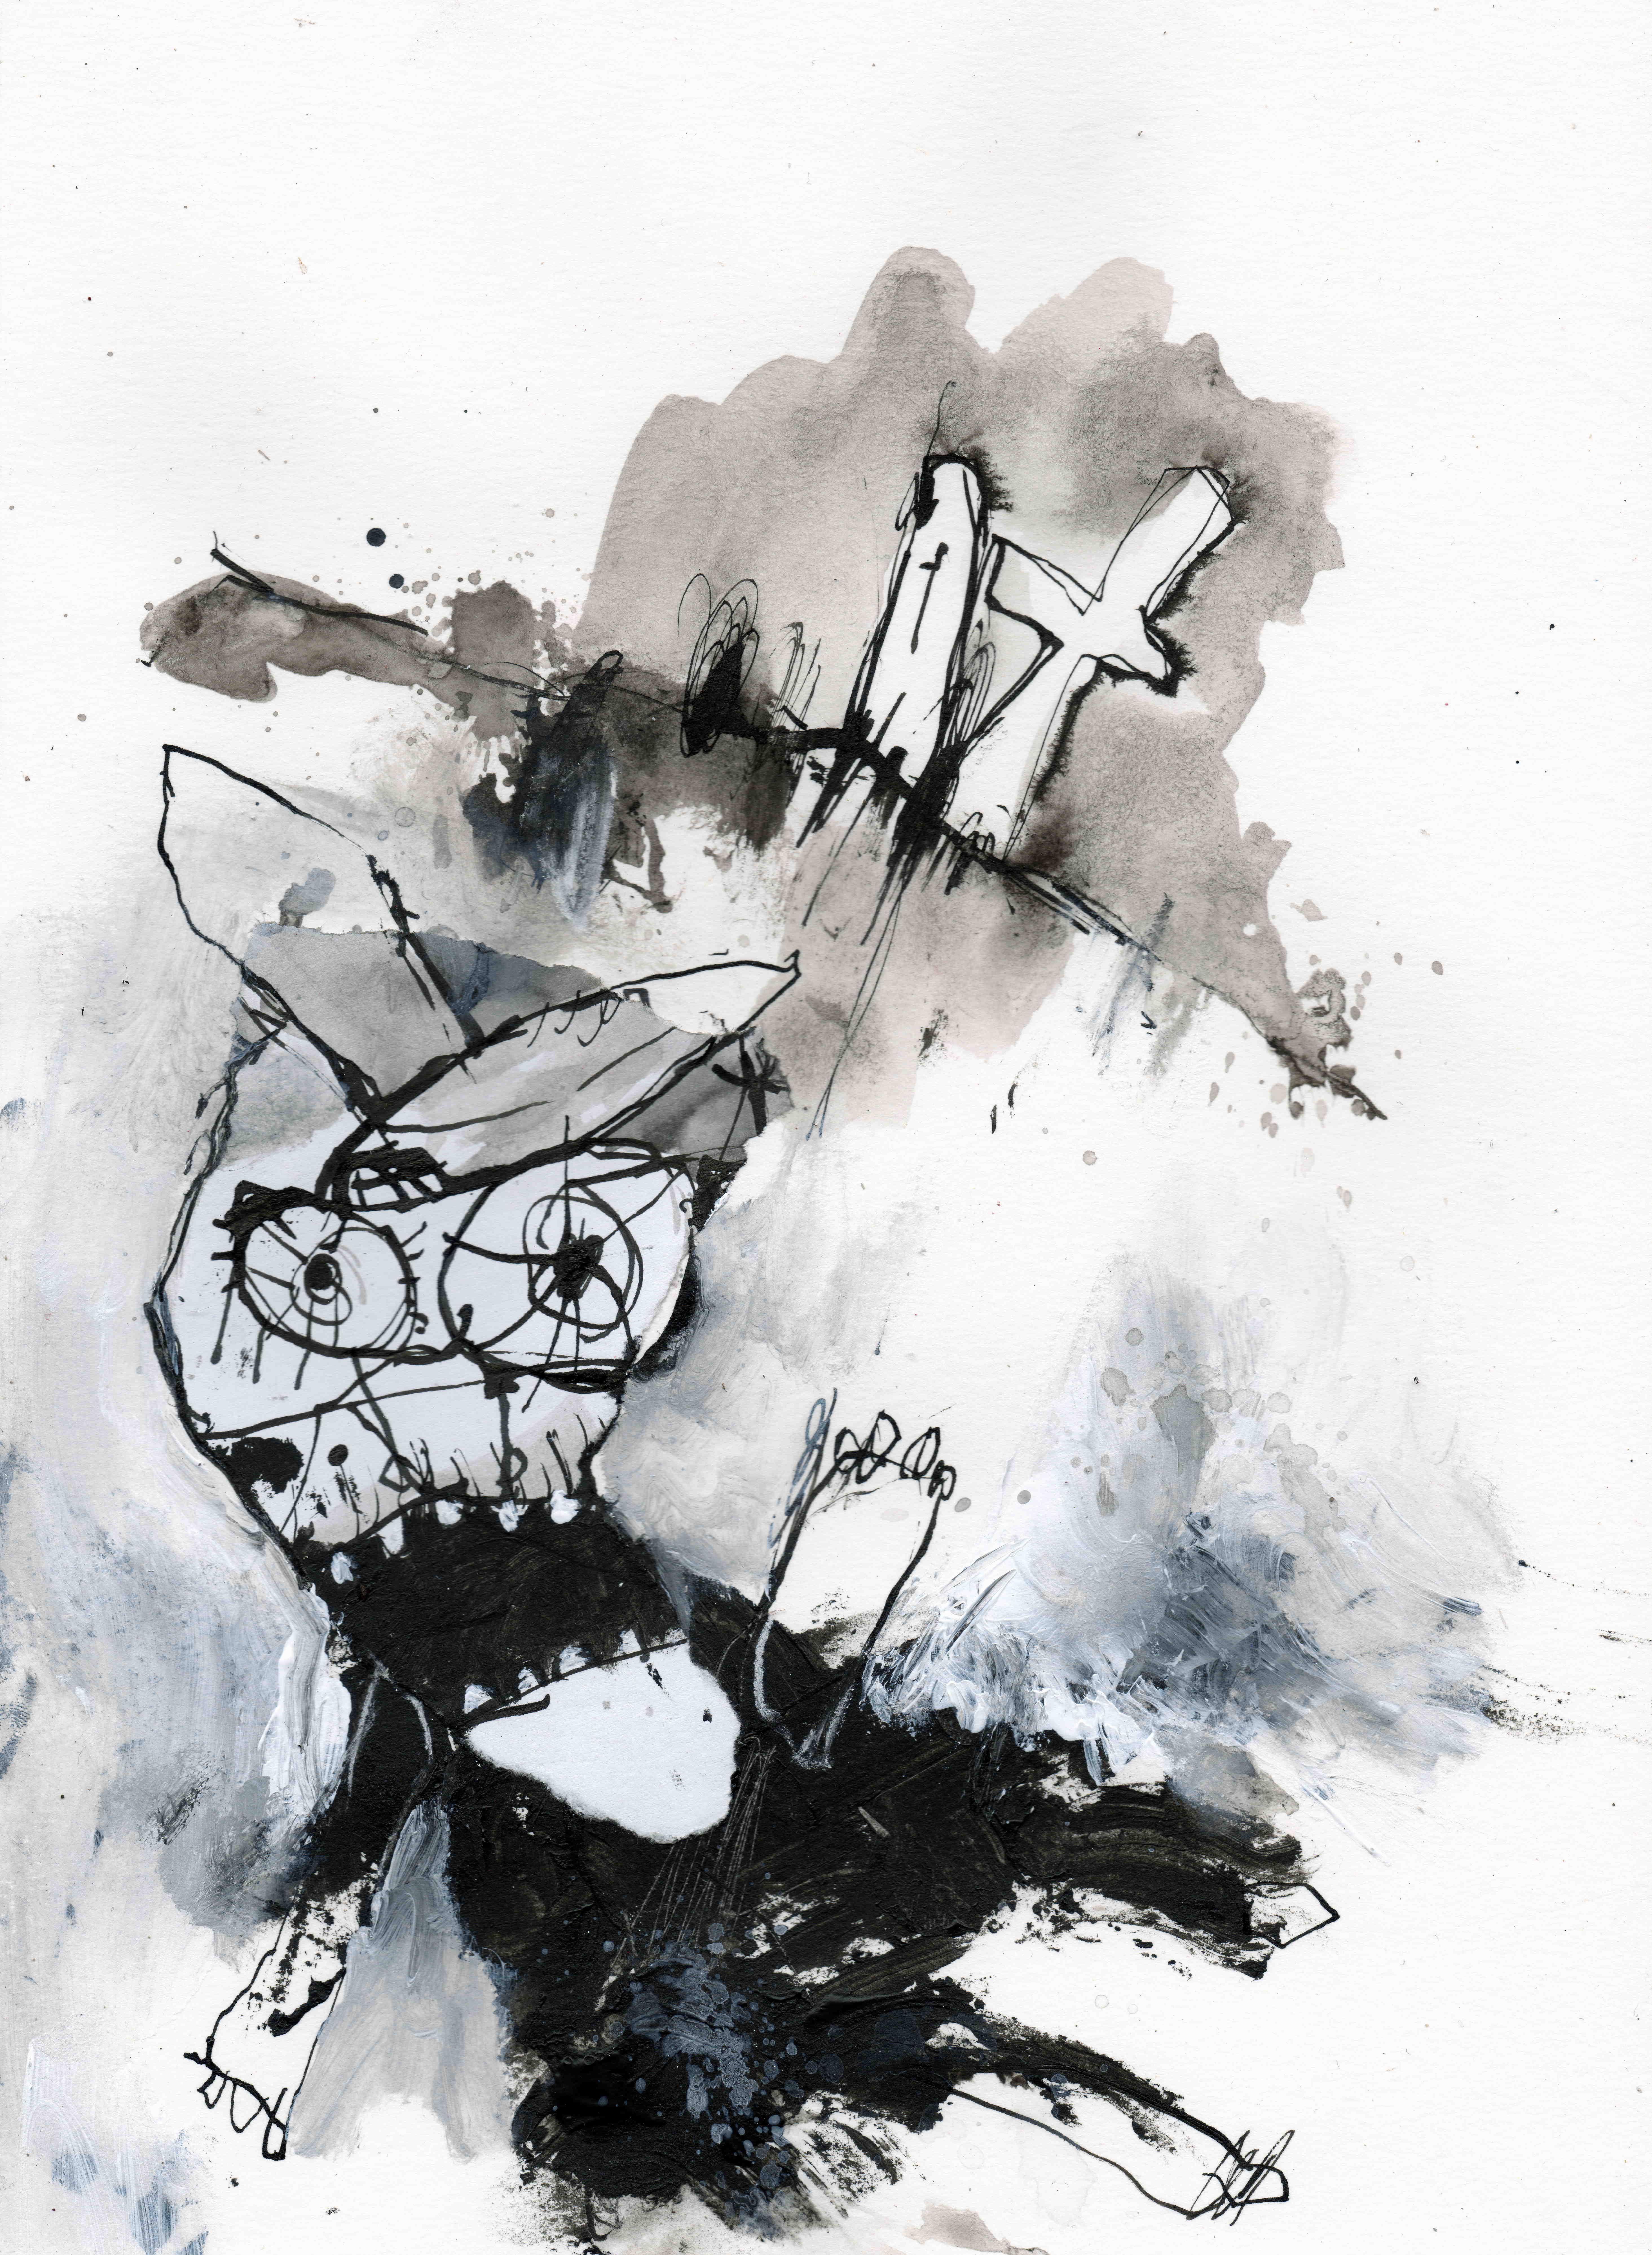 MH15 Dead poet, mixed media on paper, 21 x 29,7 cm, 2020